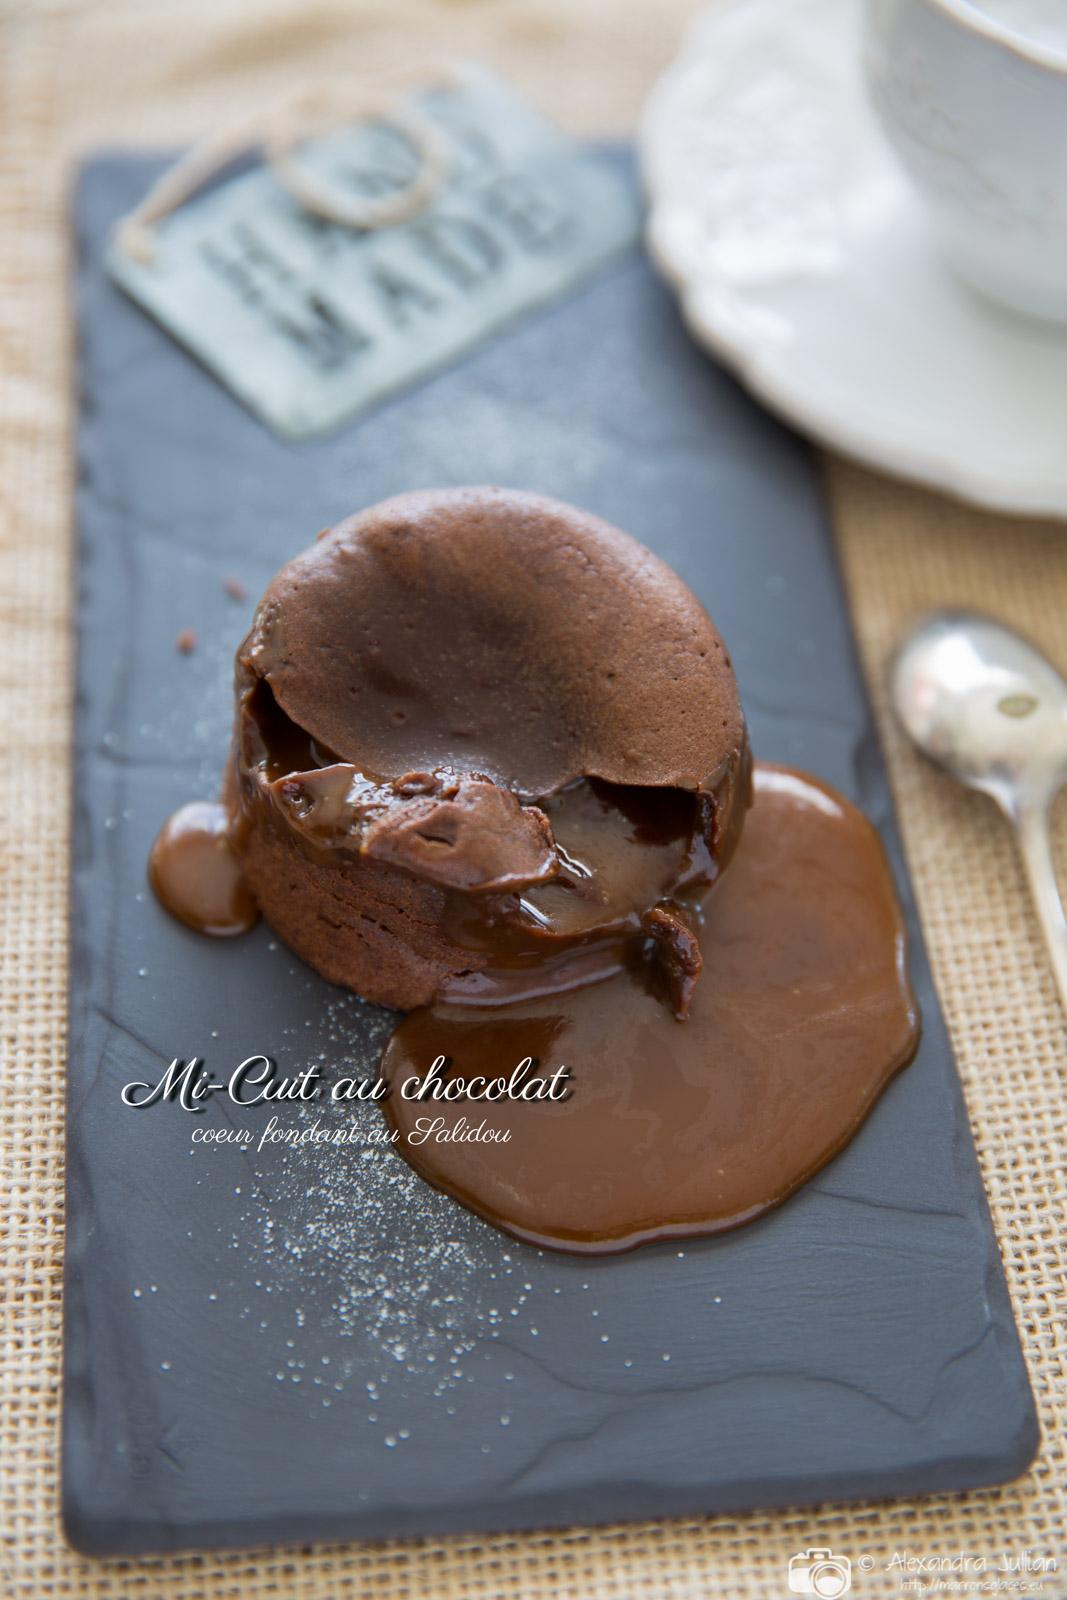 Mi-cuit au chocolat, coeur fondant Salidou